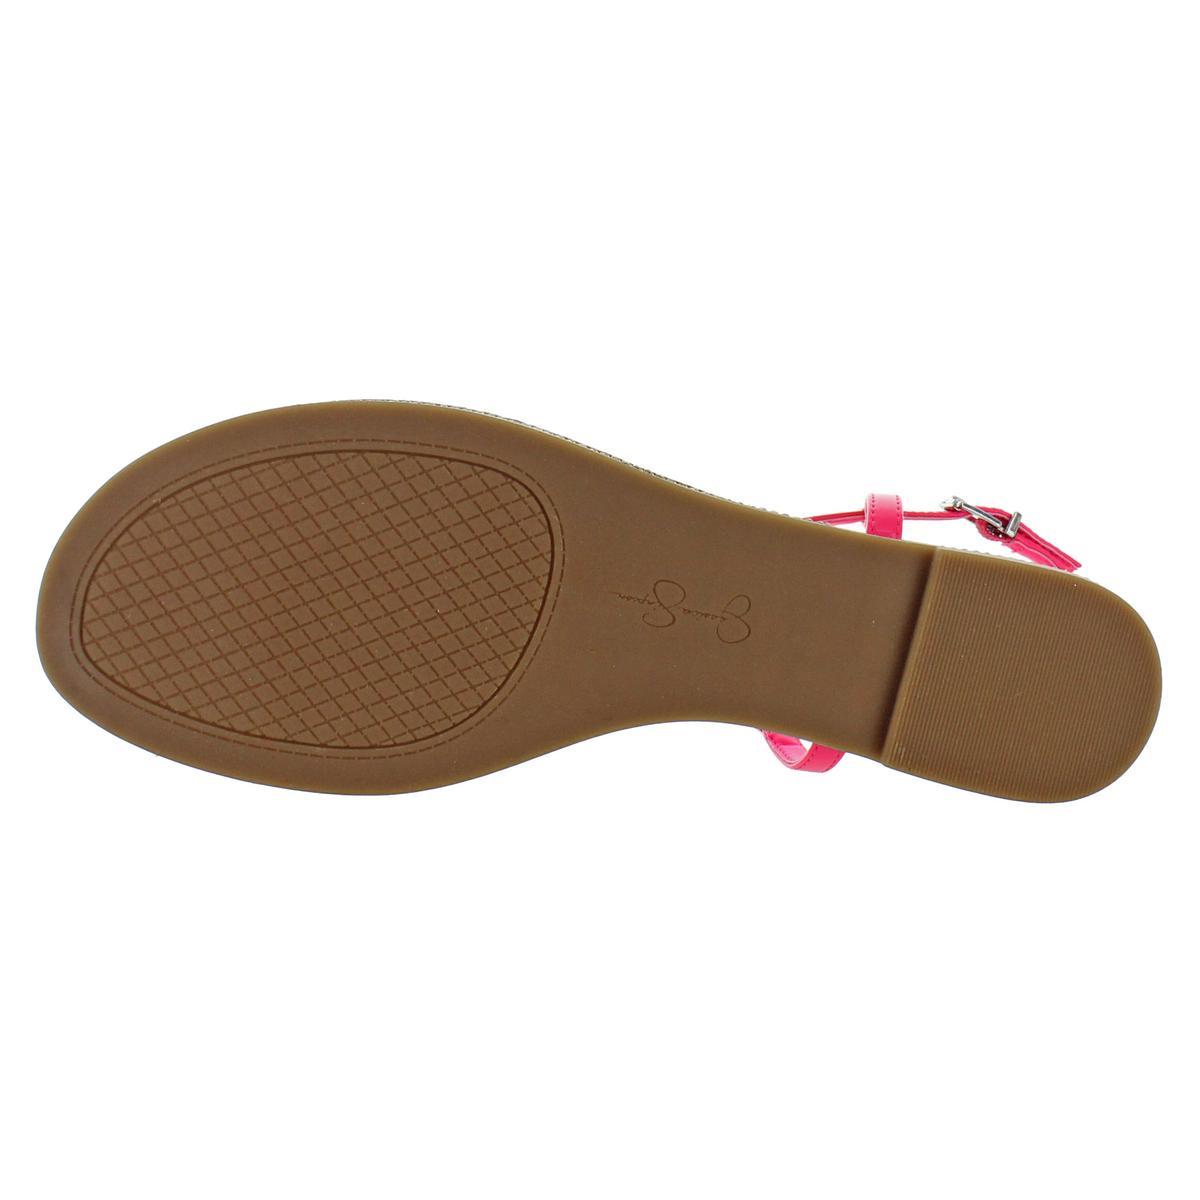 Jessica-Simpson-Femme-Brimah-Casual-String-Spartiates-Chaussures-BHFO-1194 miniature 9